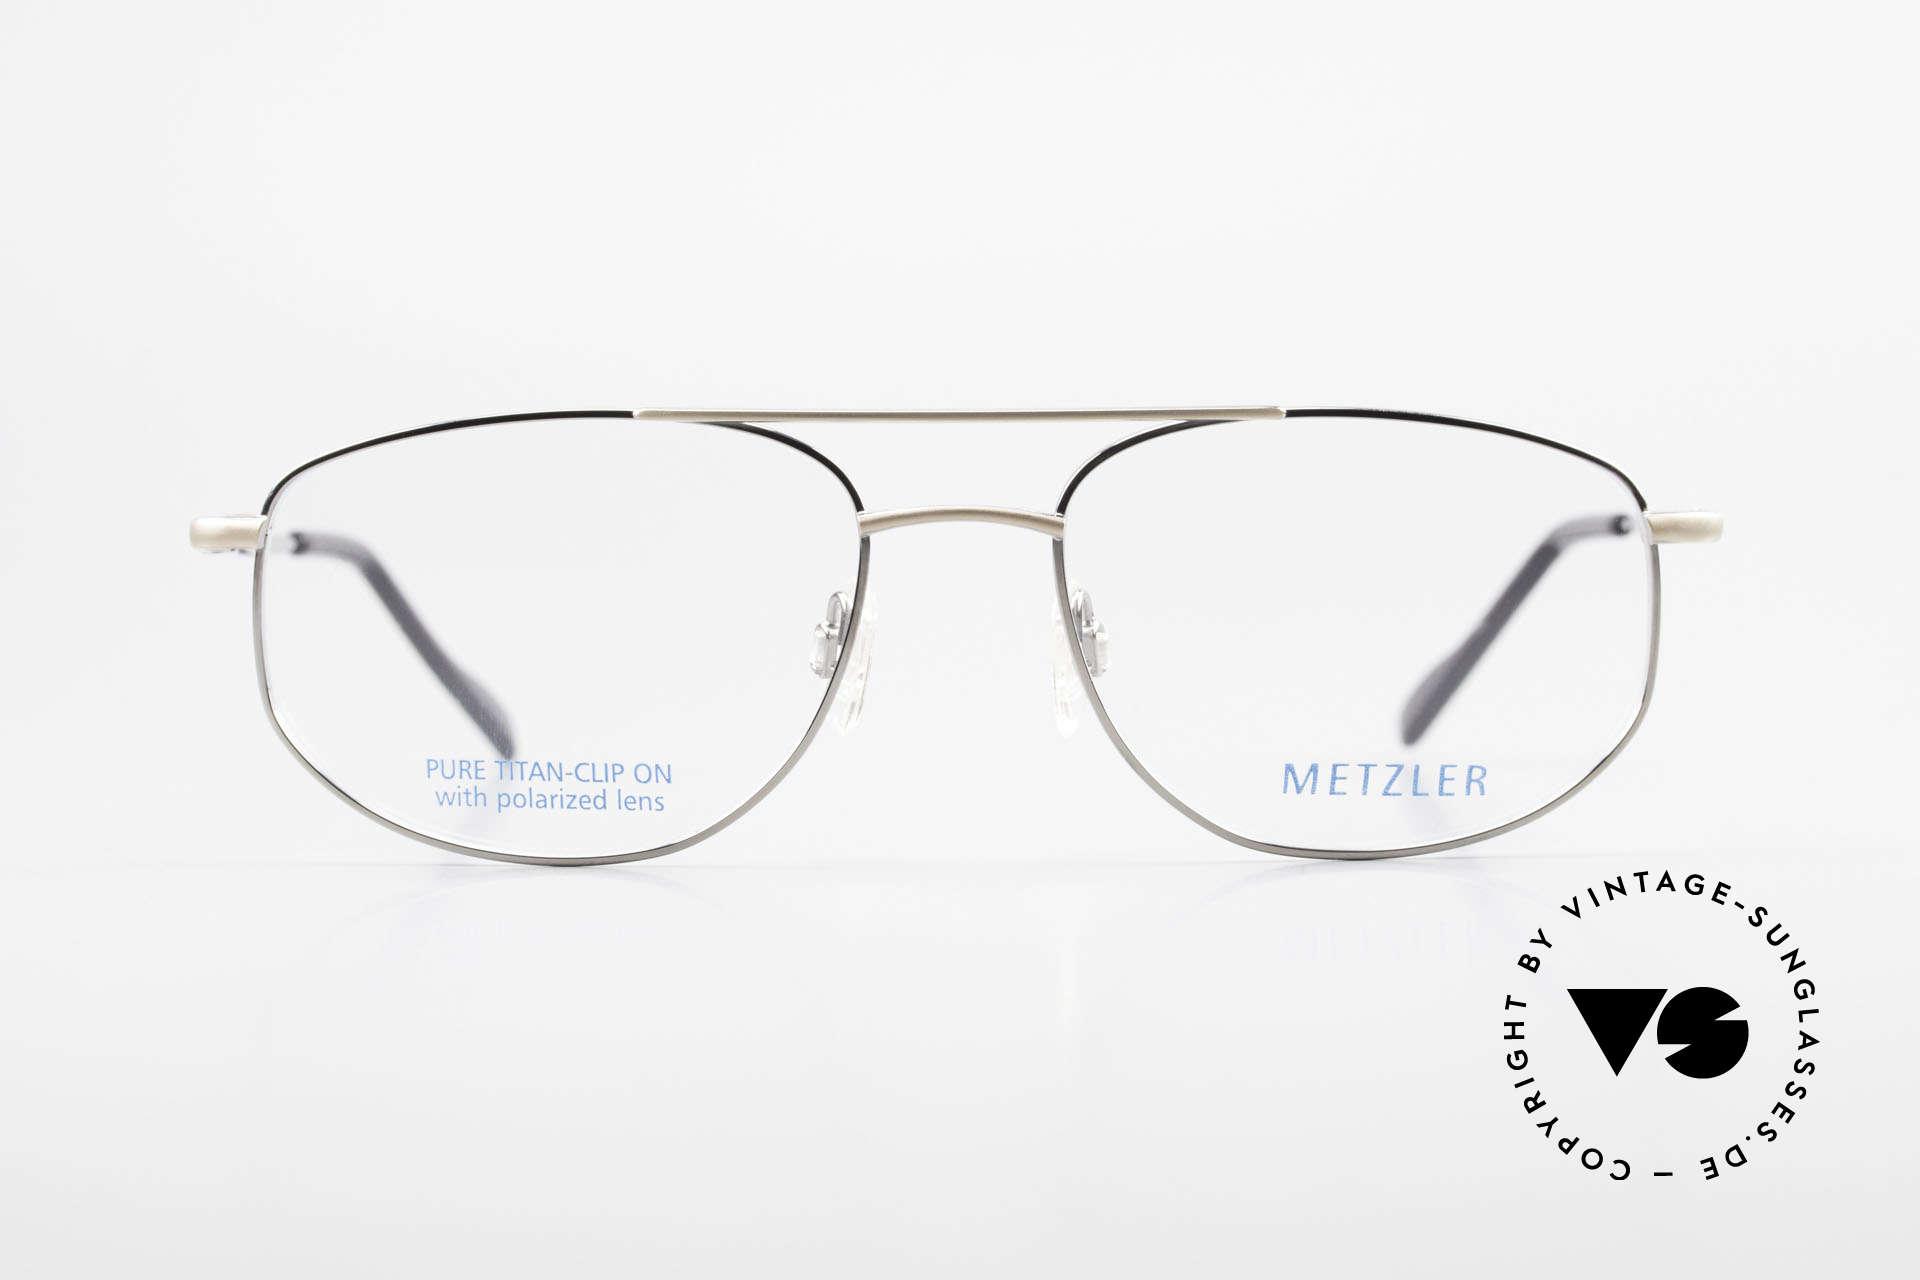 Metzler 1715 Titanium Specs Polarized Clip, Size: large, Made for Men